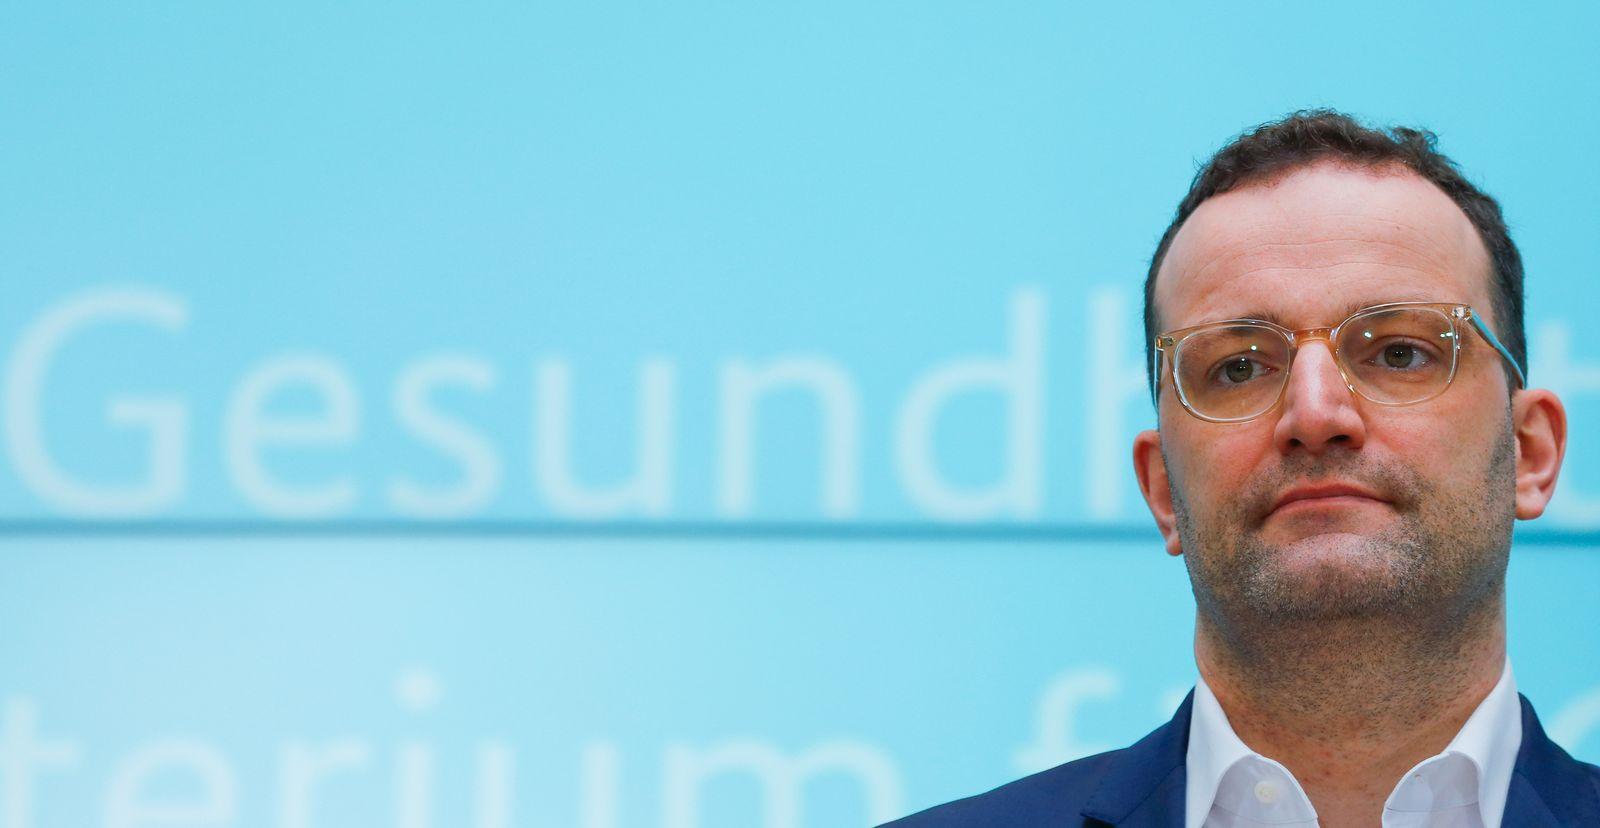 German Health Minister Spahn addresses a news conferencein Berlin